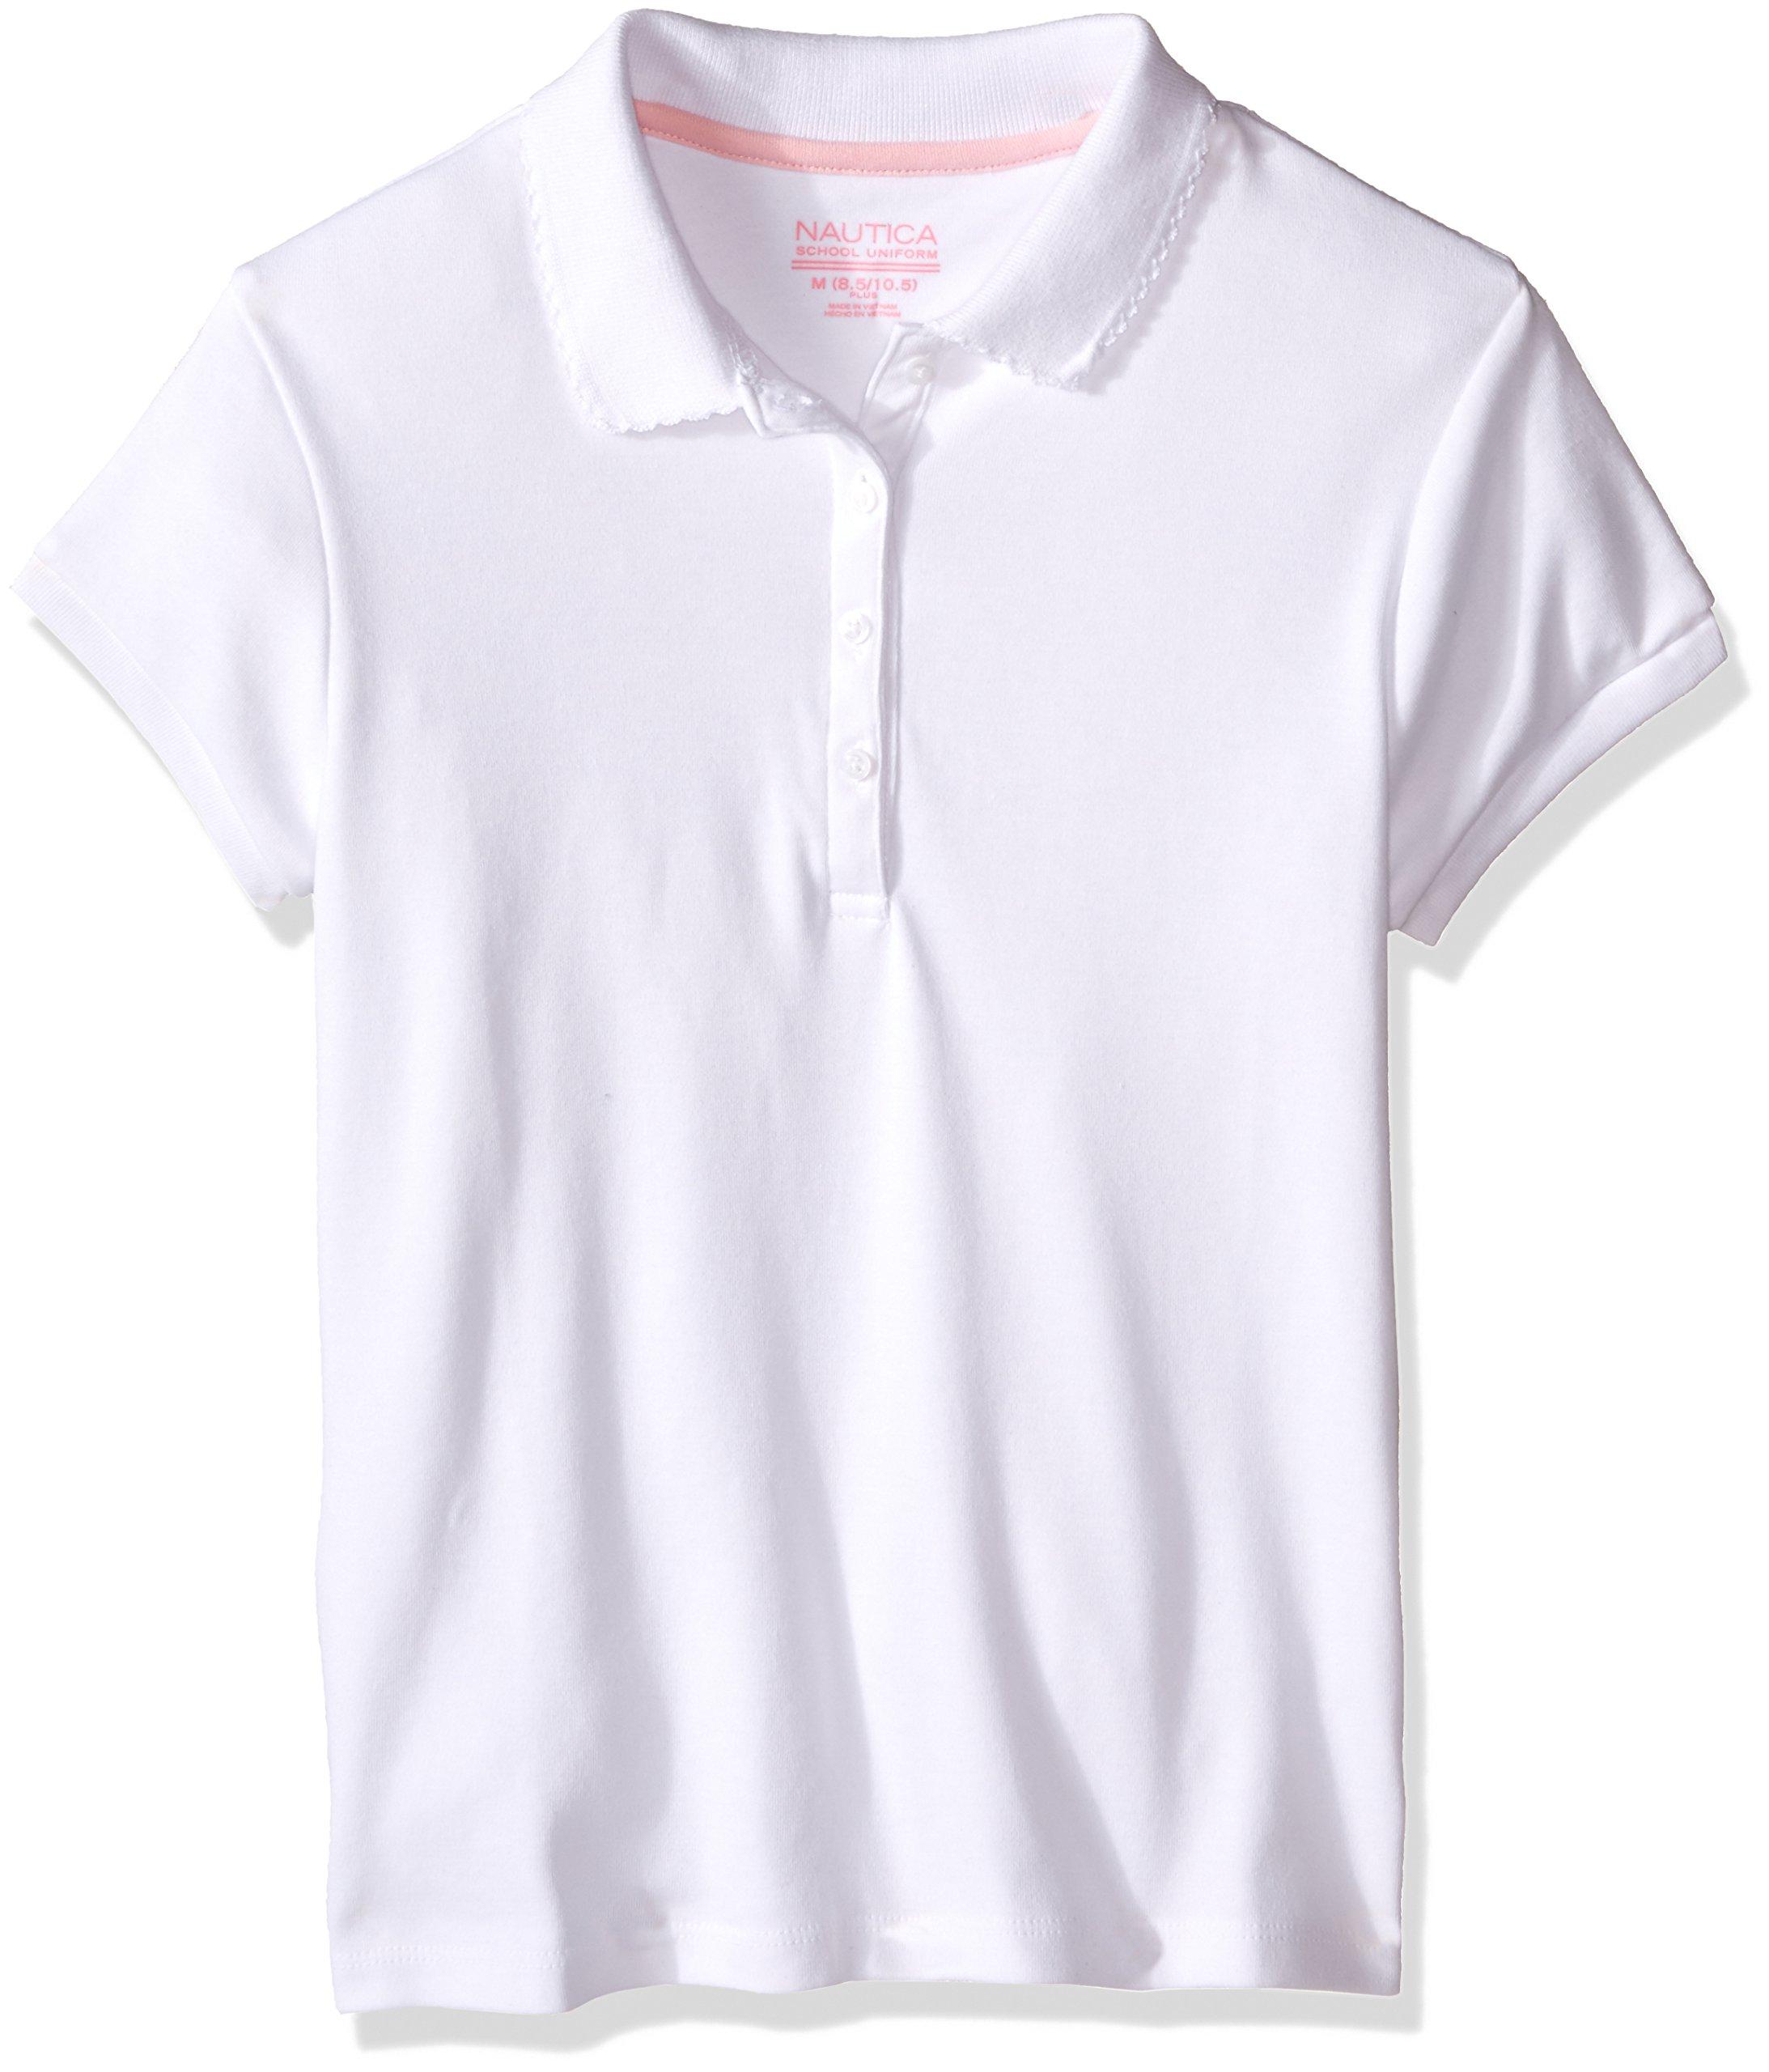 Nautica Girls' Short Sleeve Polo, White, Medium(8-10)